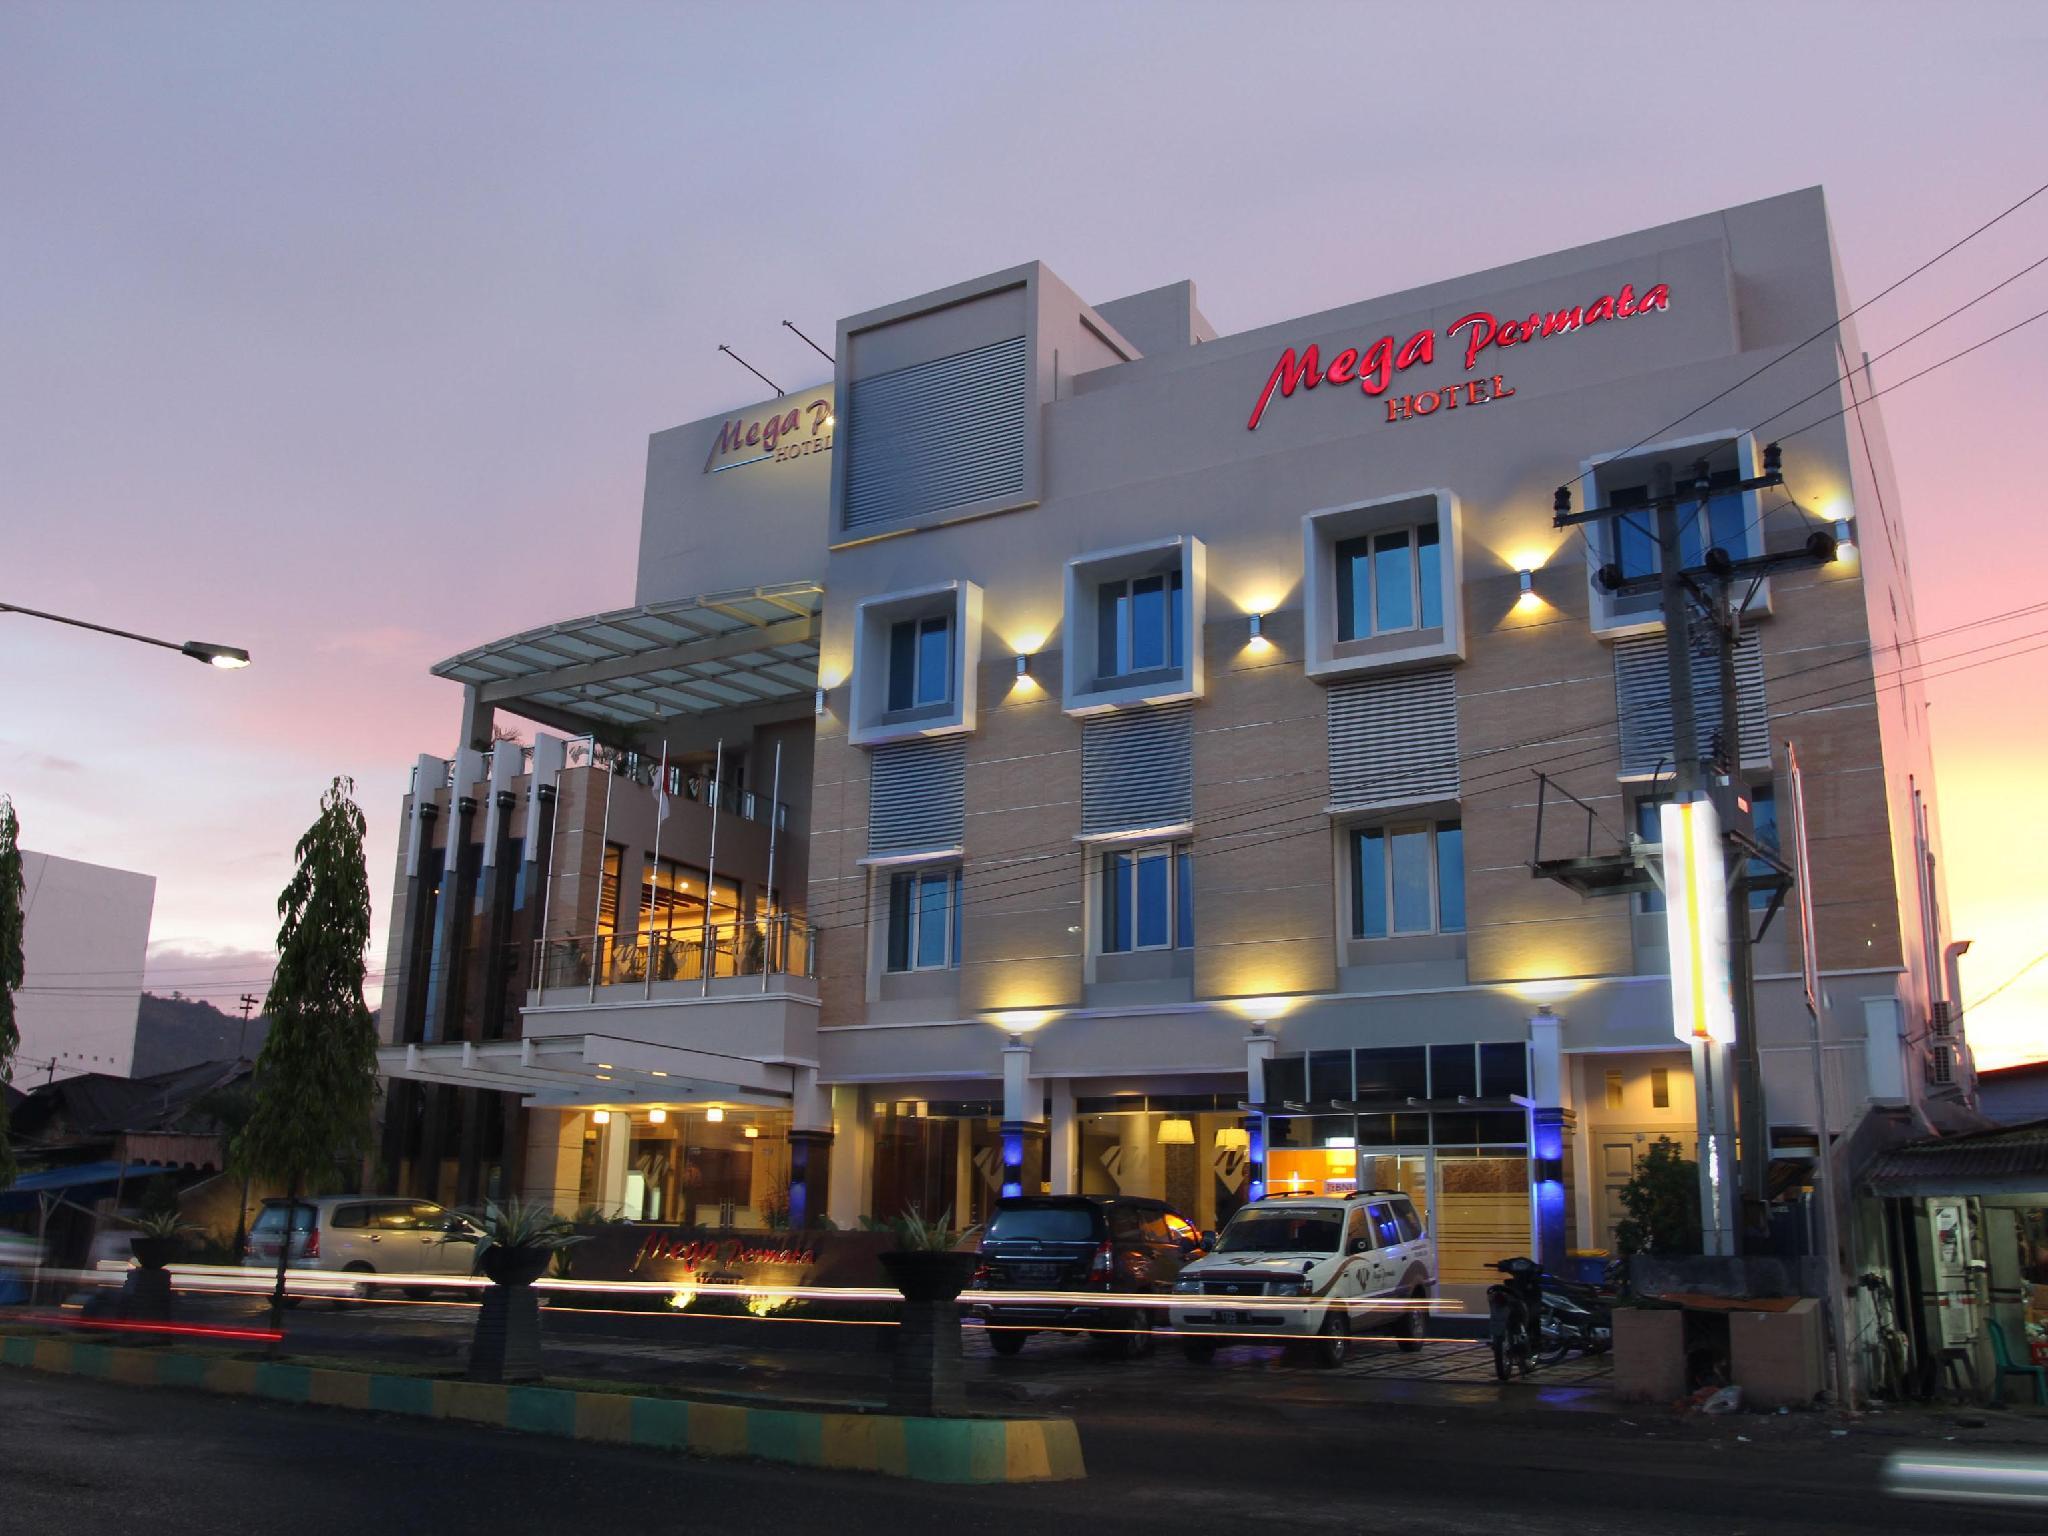 Mega Permata Hotel, Padang Lawas Utara